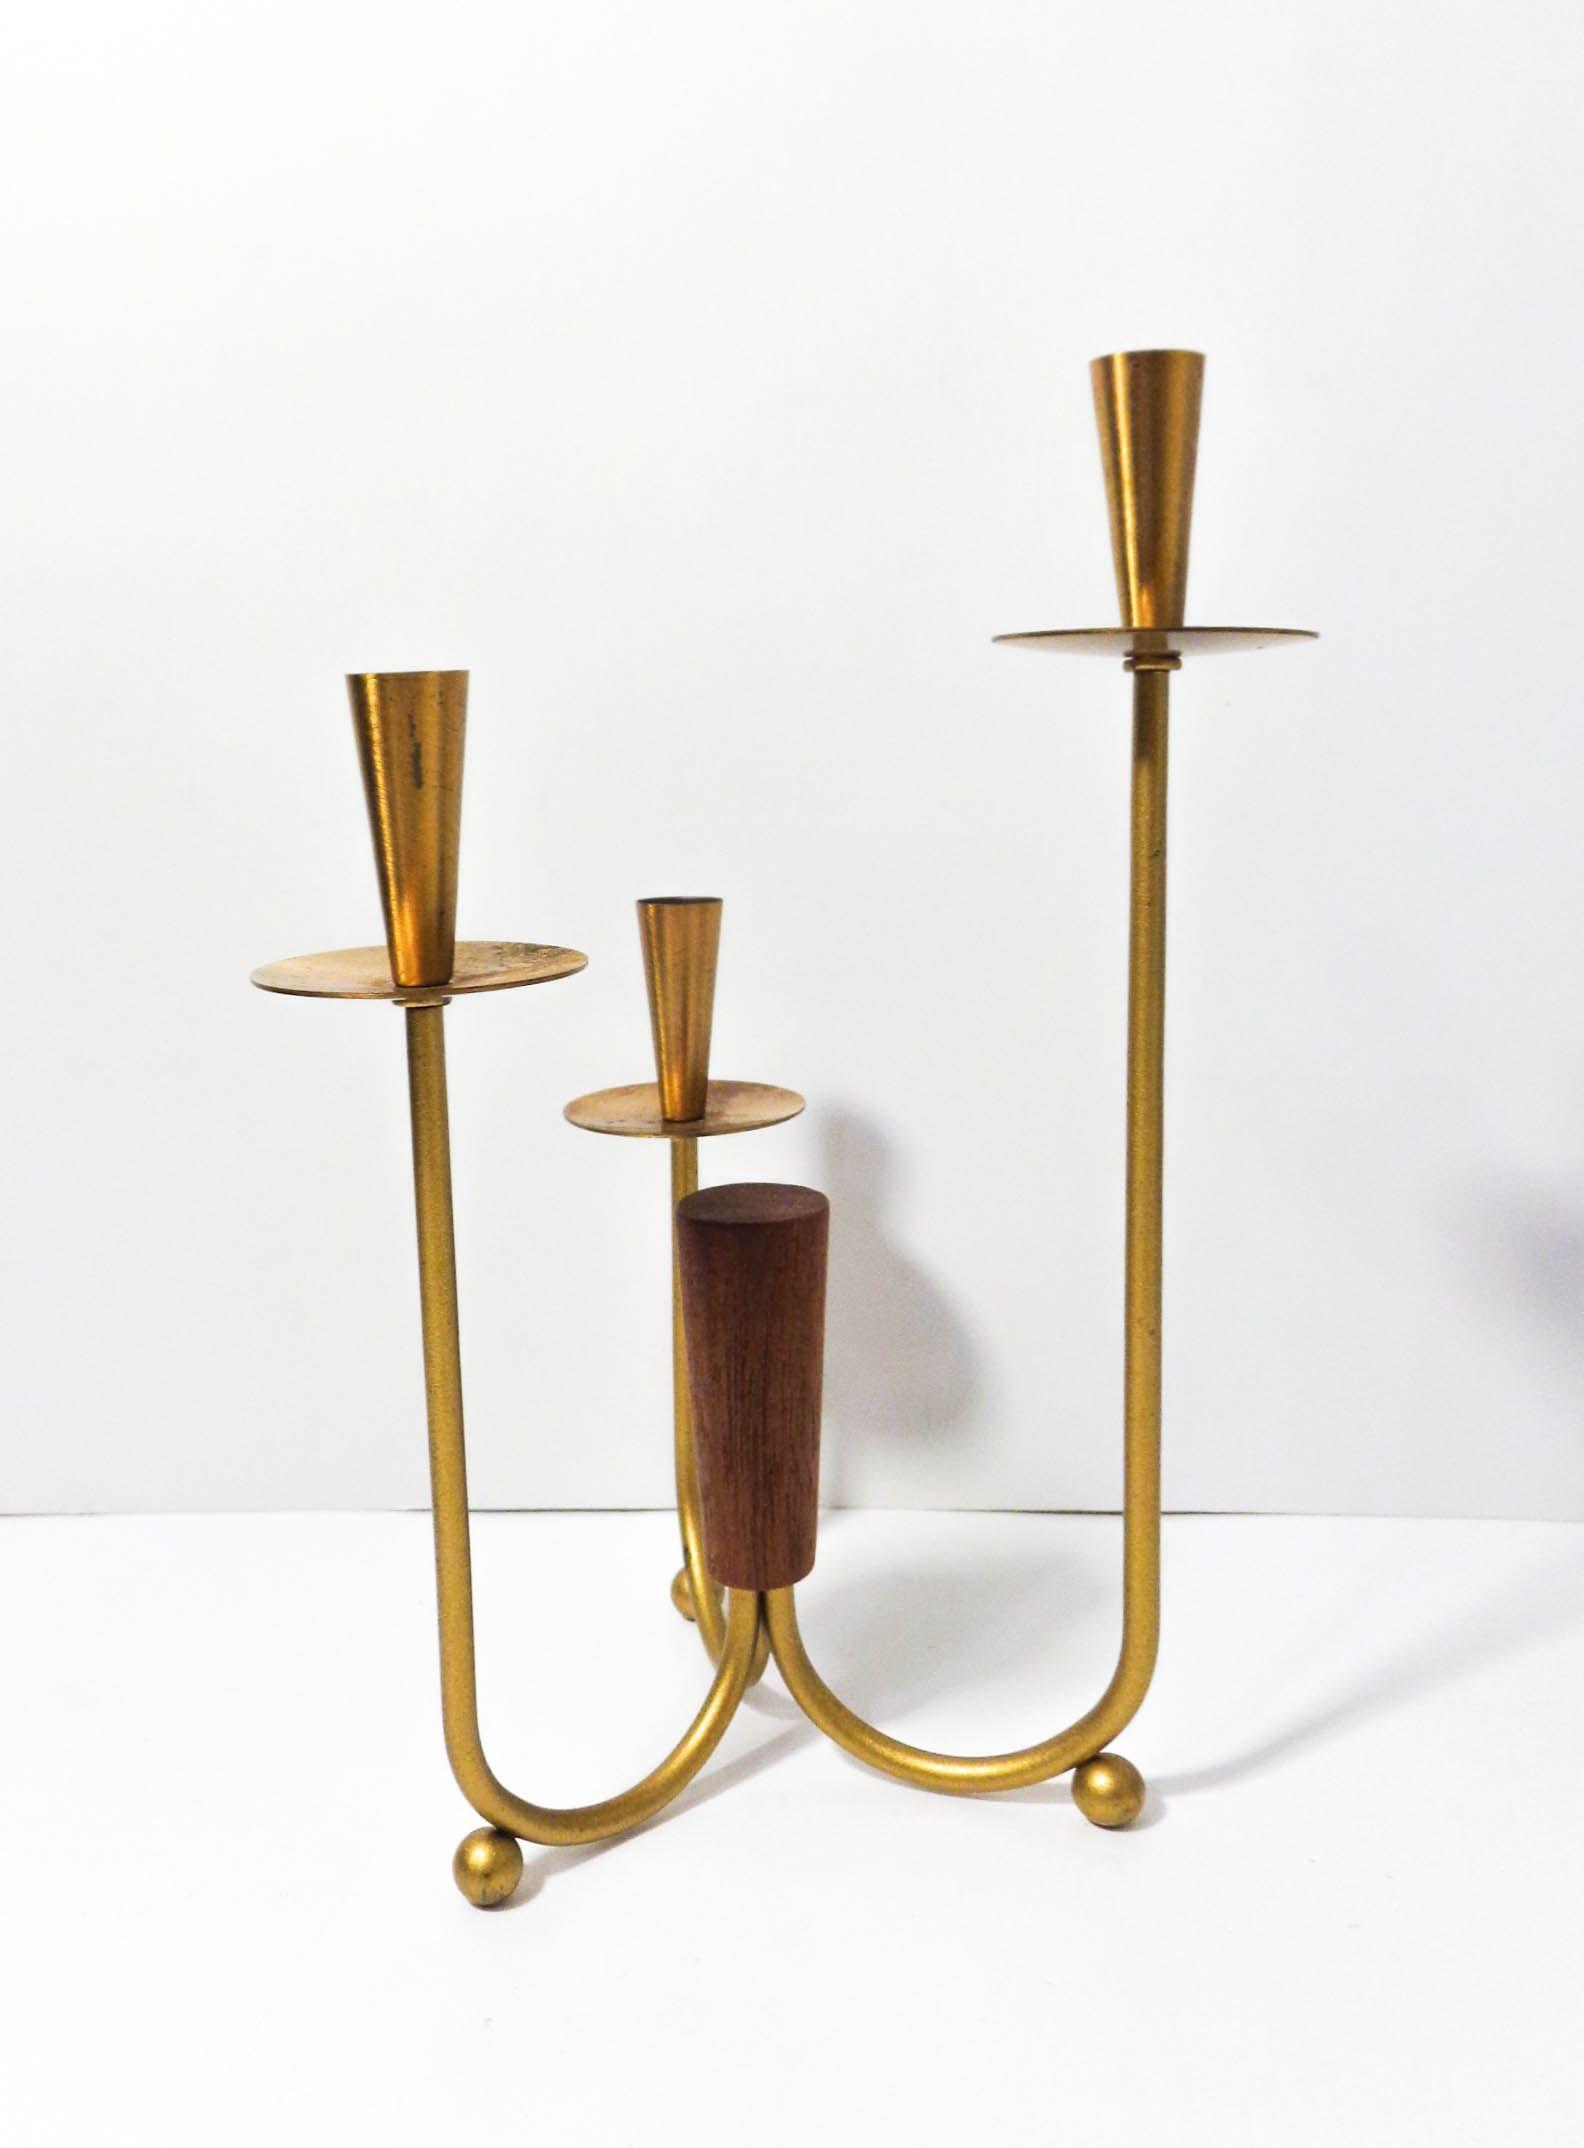 Brass Sleek Scandinavian Candelabra With Teak Sold Candle Holder Decor Mid Century Modern Lighting Vintage Lighting